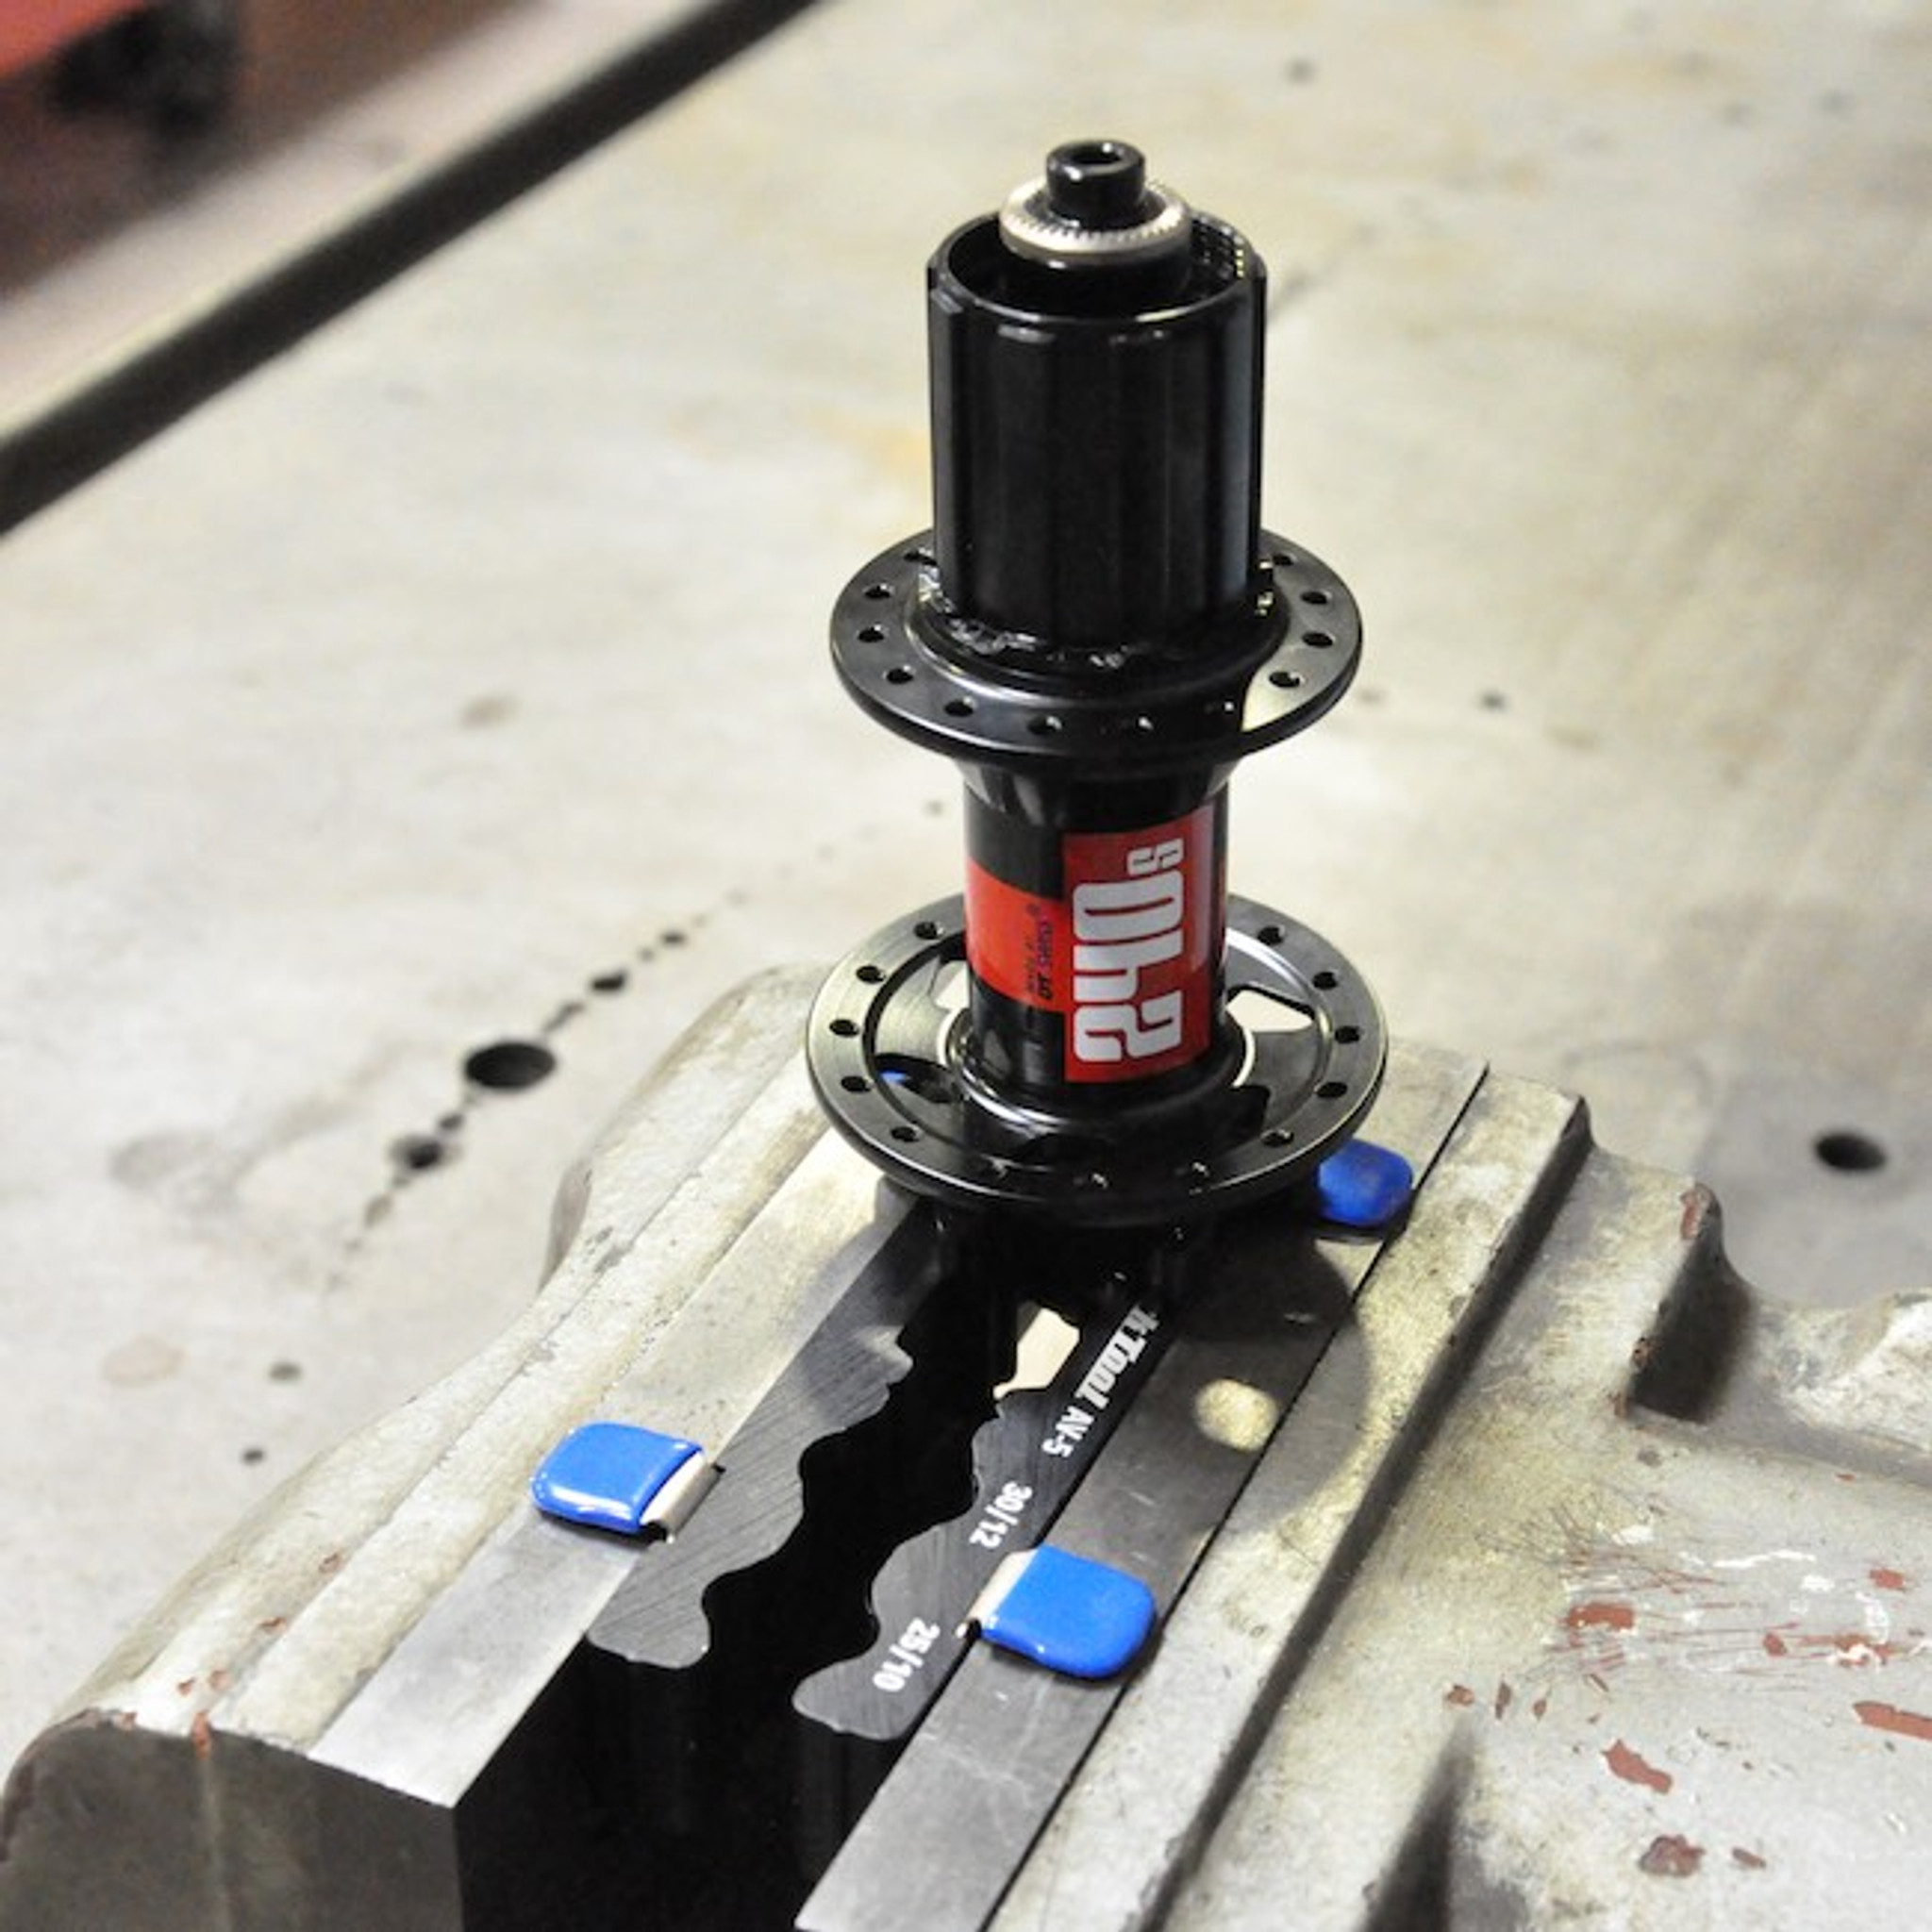 DT Swiss 350 Straight Pull F or R Hub 28H 15x100//12x142mm Thru Axle-Center Lock